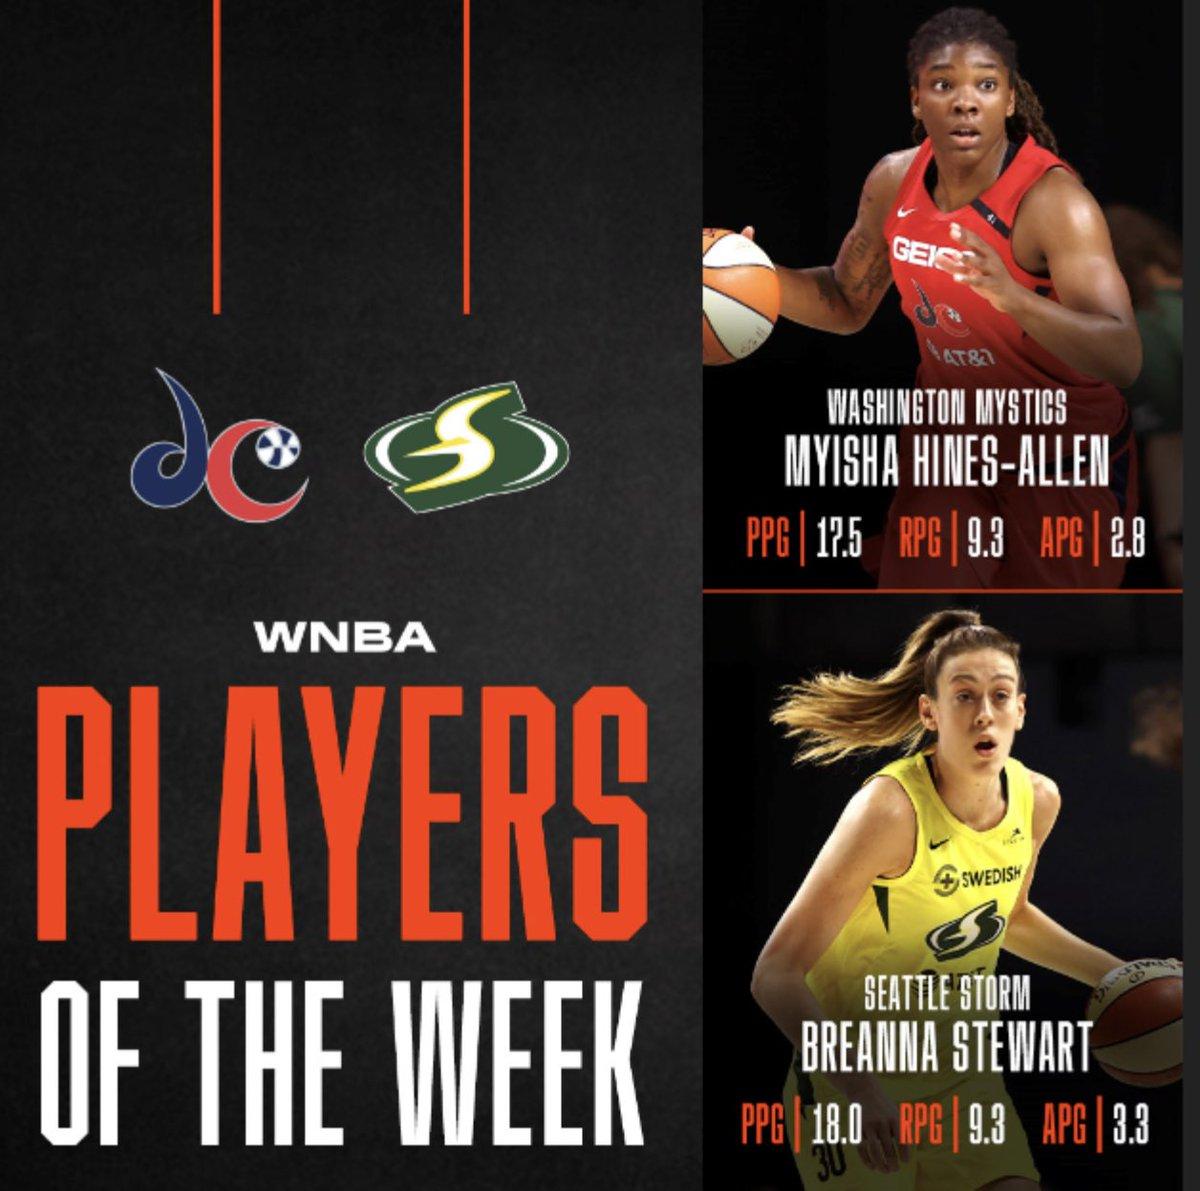 Players of the Week for the @WNBA @breannastewart @Mooks_22 https://t.co/nVmrtu7lRs